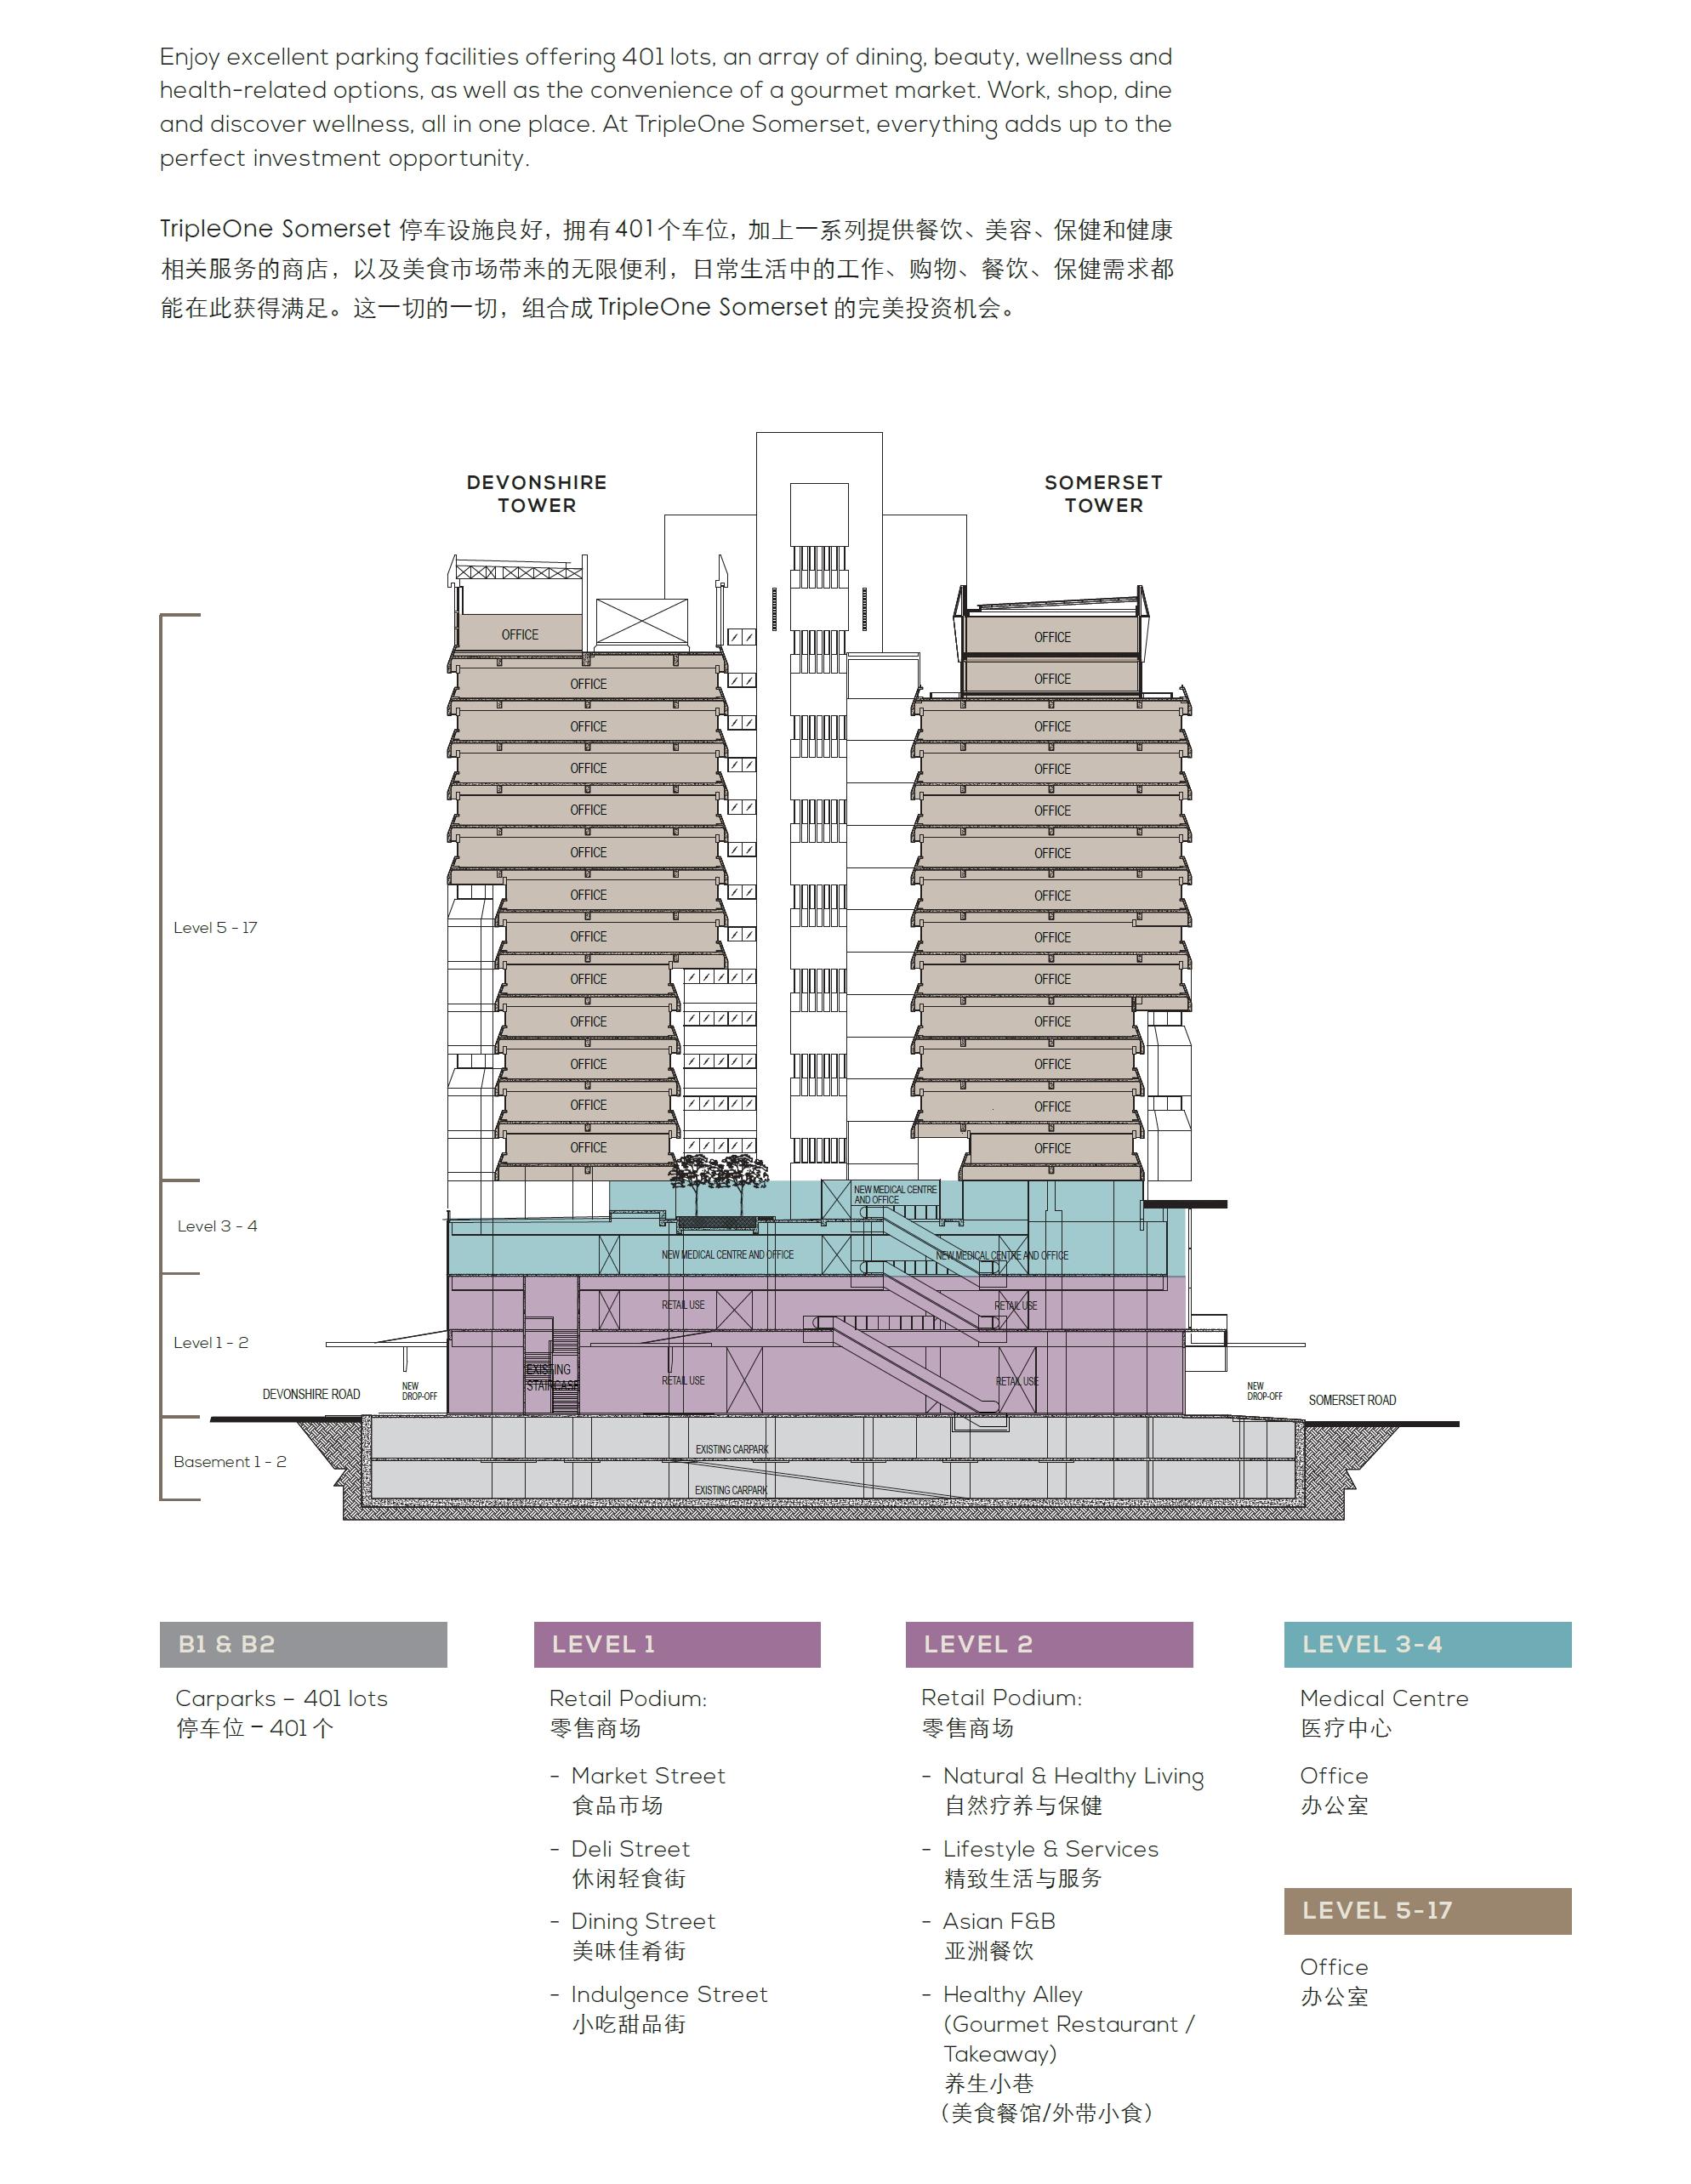 TripleOne Somerset site plan